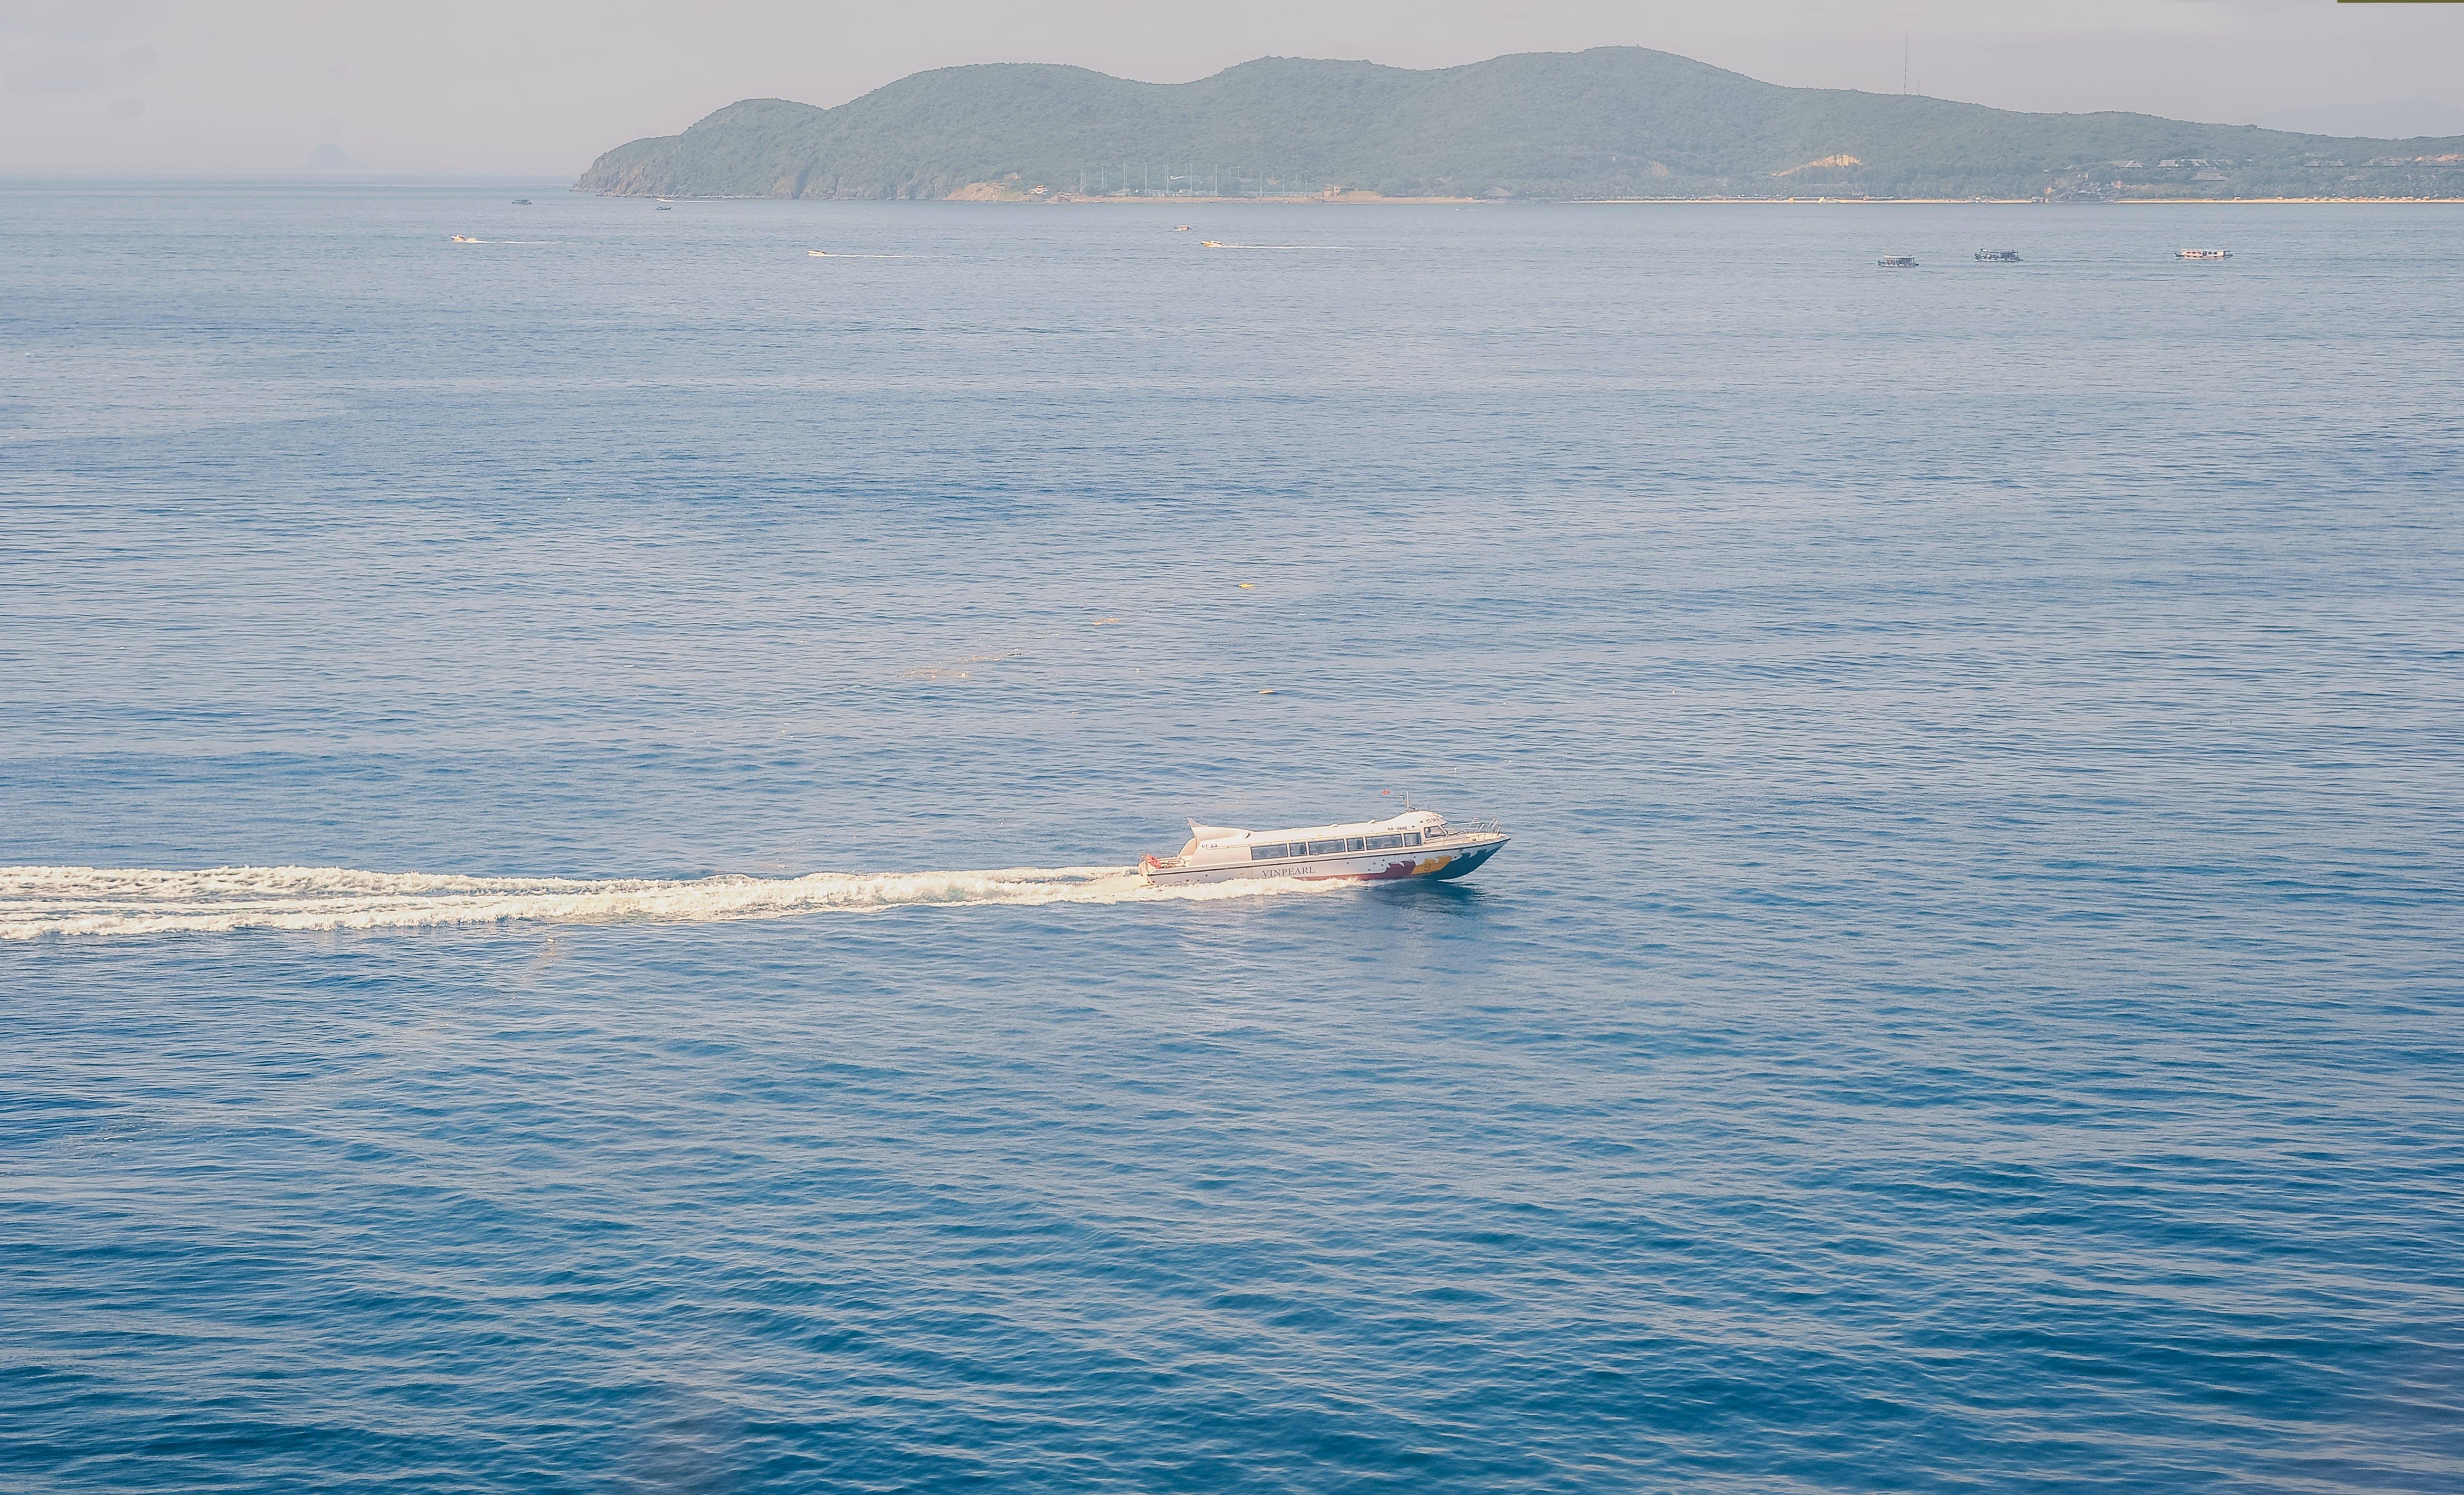 Aerial Photo of White Motor Boat on Ocean